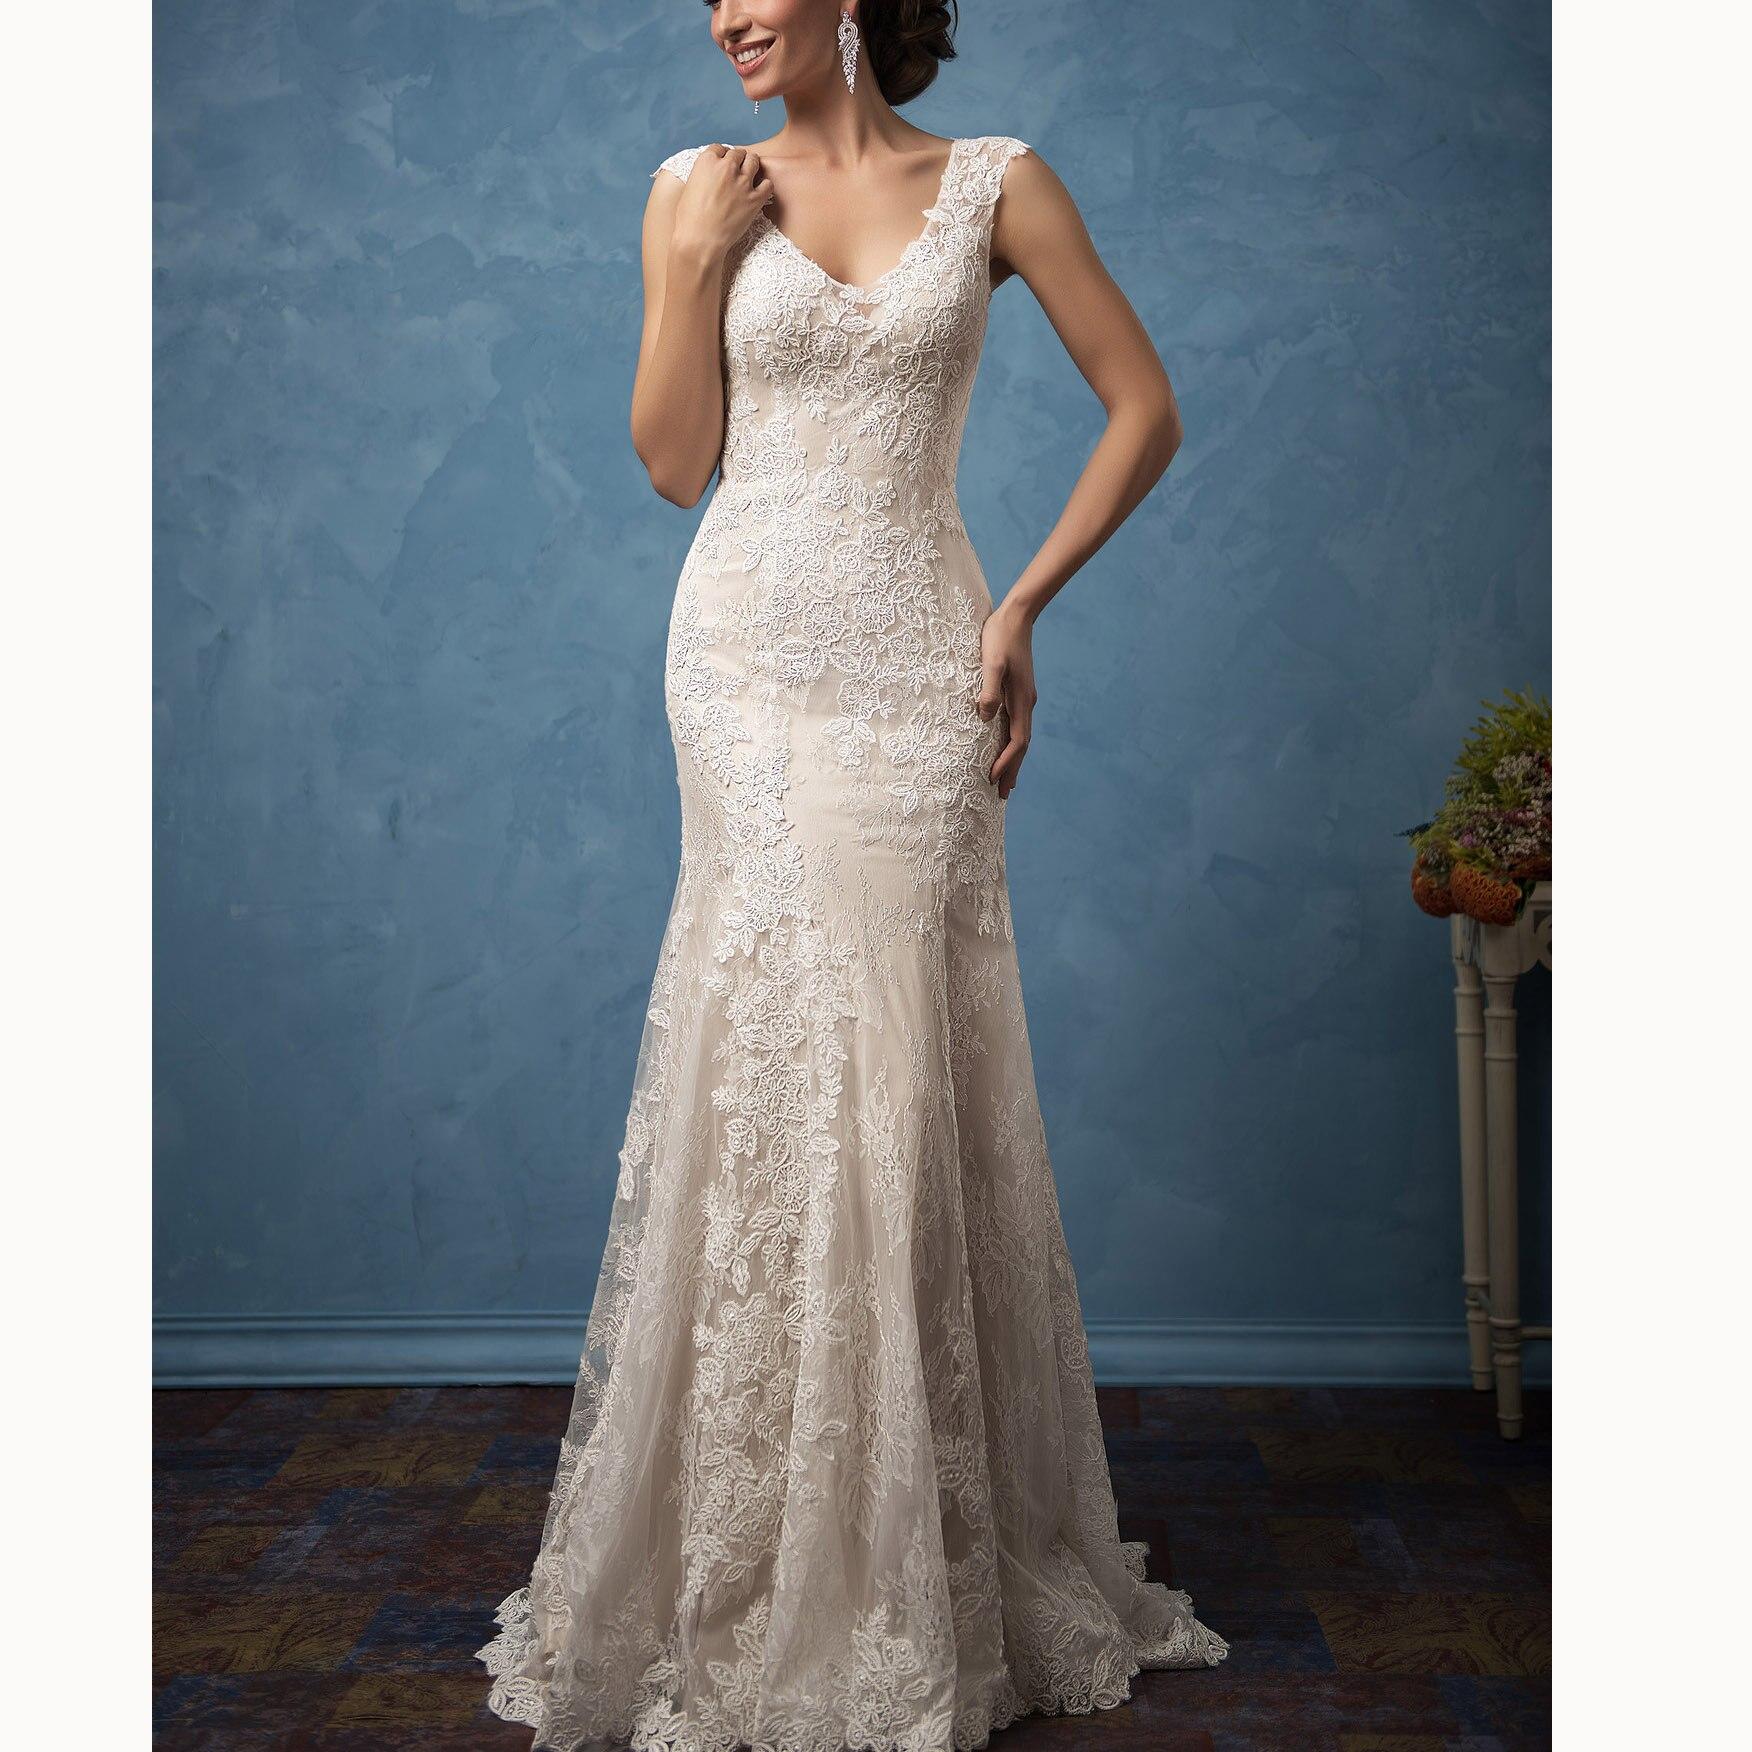 Vestidos De Festa Lace Ivory Appliques Deep V-neck Mermaid Dresses Cap Sleeves Court Train Wedding Dresses Bridal Gowns